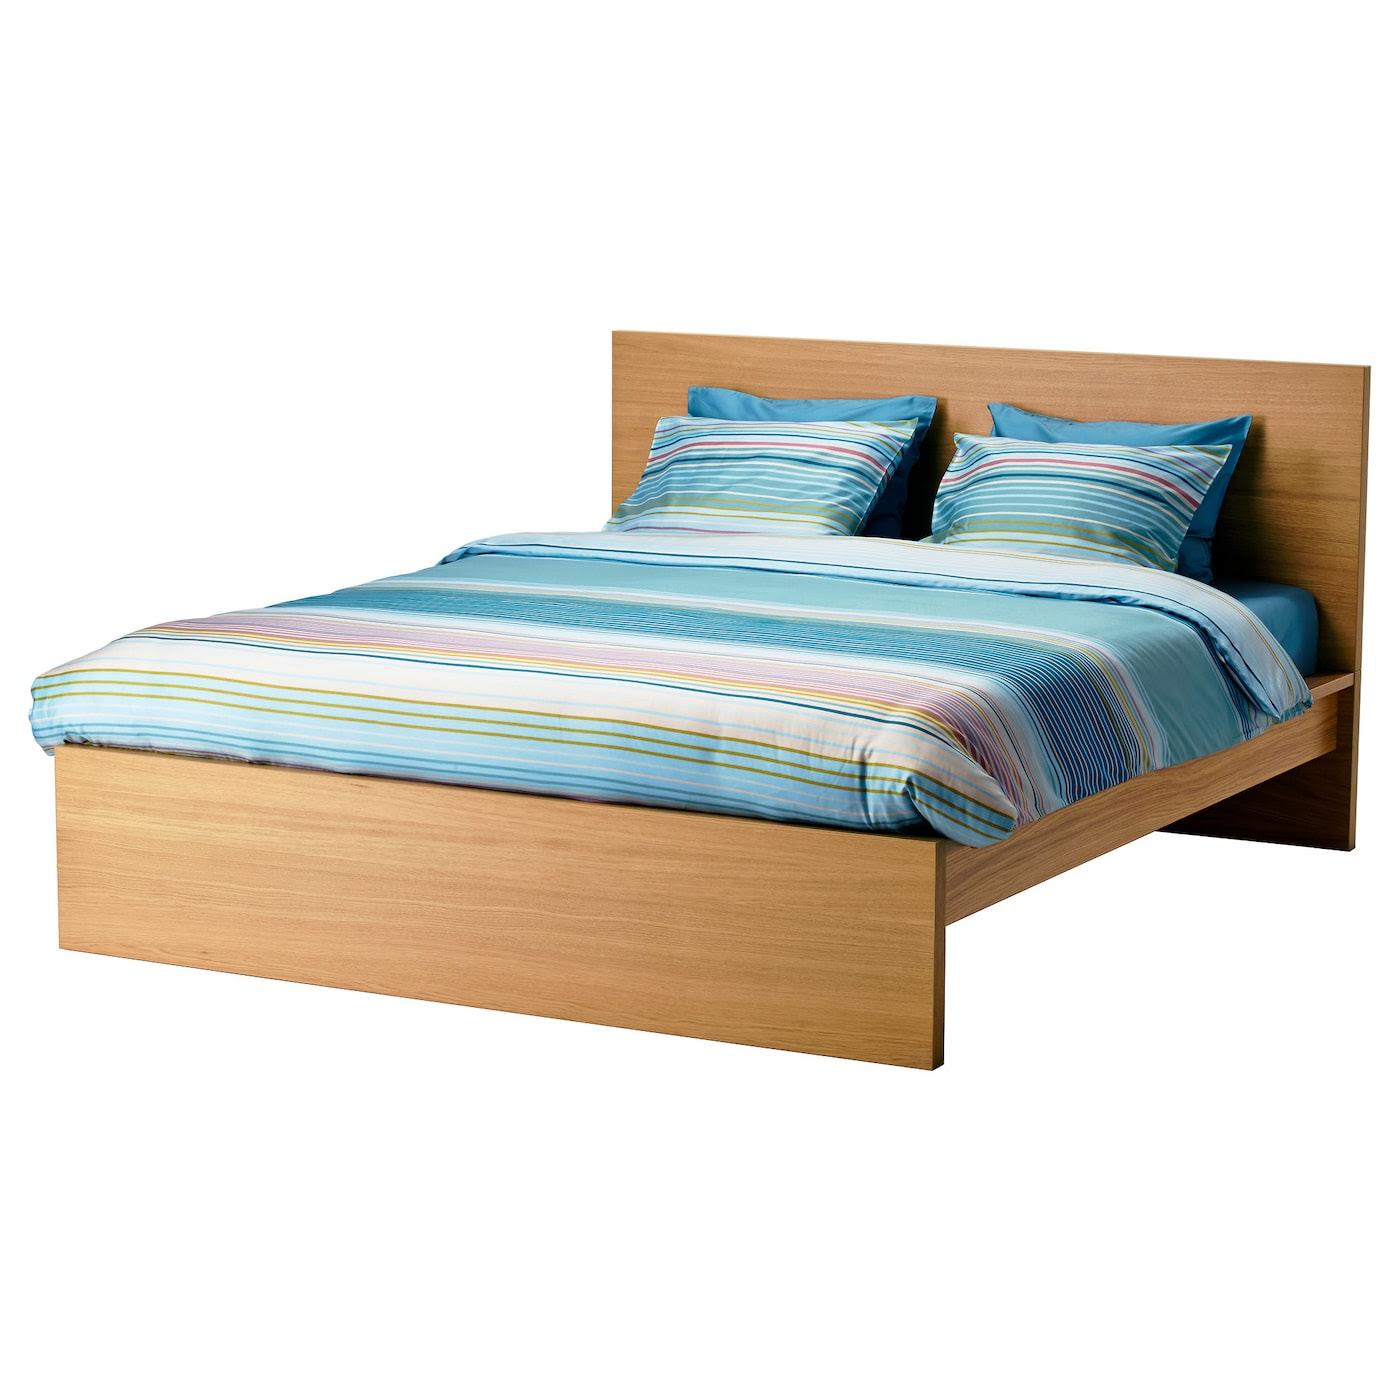 Ikea Lit Mandal Interesting Wallbeds Murphy Bed Ikea Ikea Mandal